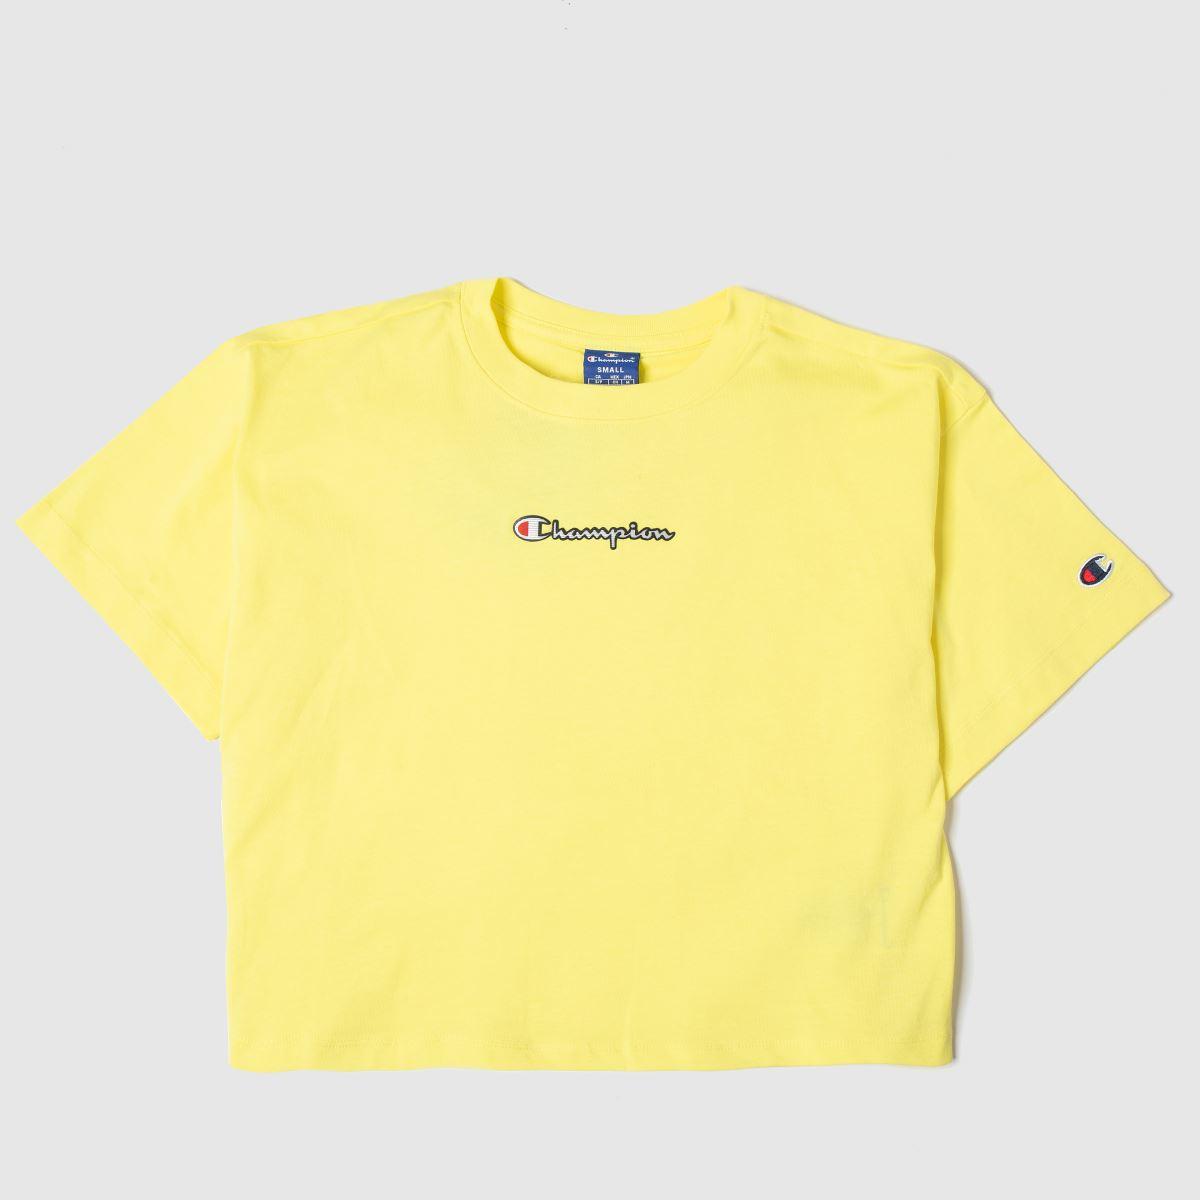 Champion Clothing Champion Yellow Cropped T-shirt